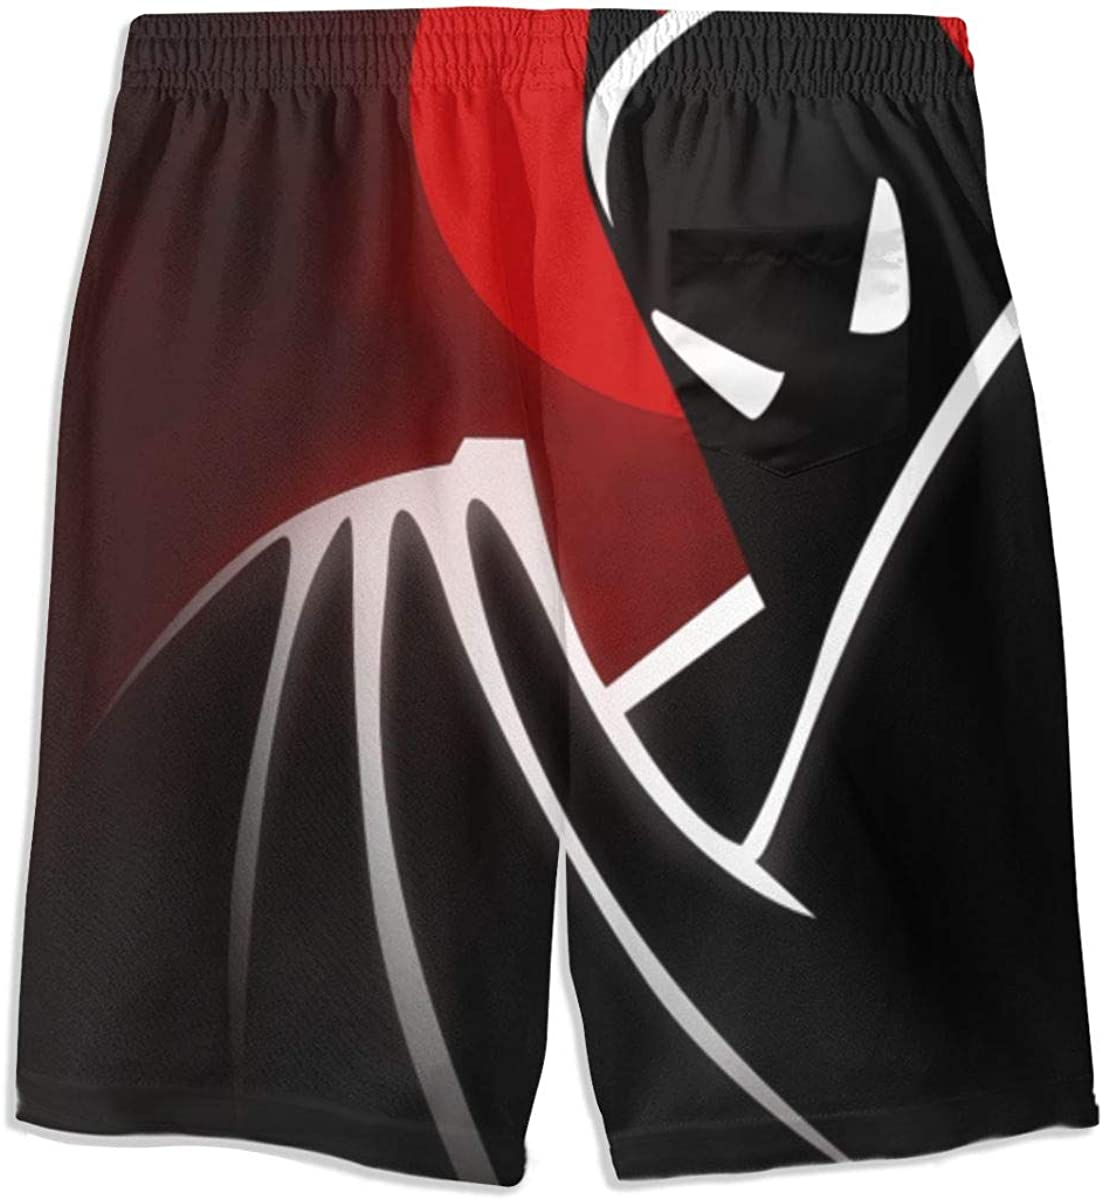 Amazon Com Suicide Squad Joker Swim Trunks Quick Dry Swimwear Shorts Casual Board Shorts With Pockets Boys Girls Swimsuit Clothing